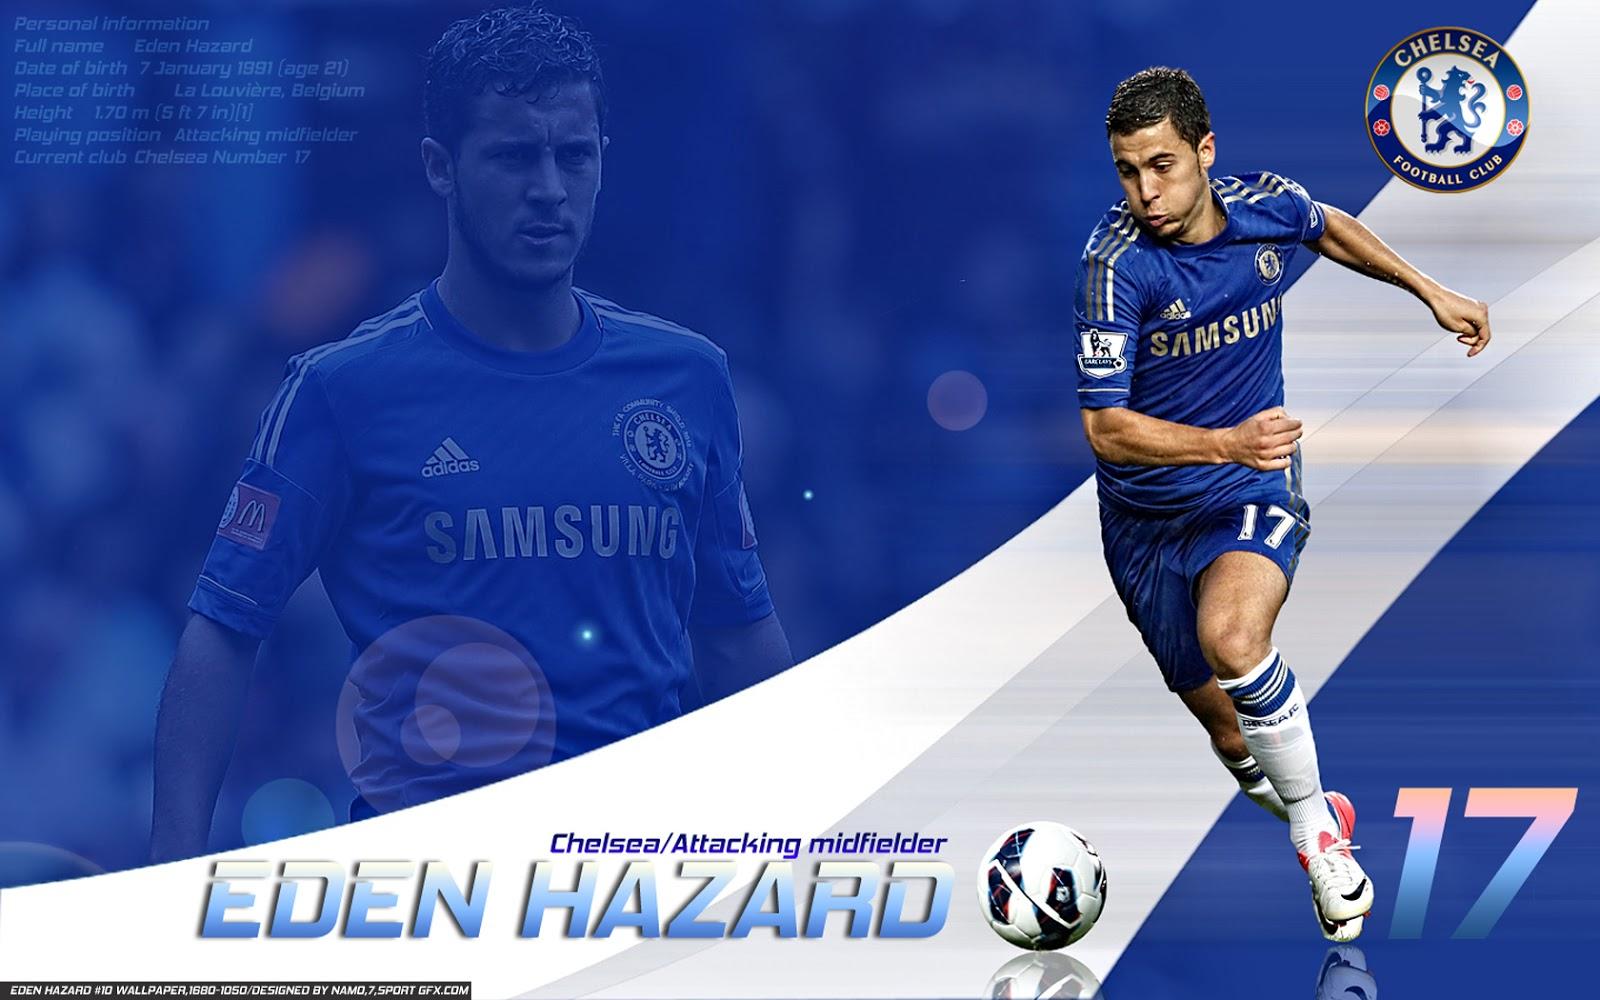 http://1.bp.blogspot.com/-rKkQZWlbOPg/UOWnM8lGOXI/AAAAAAAAOH8/2Y8l7Ay_7io/s1600/Eden+Hazard+2013+Wallpaper+HD+Chelsea+7.jpg